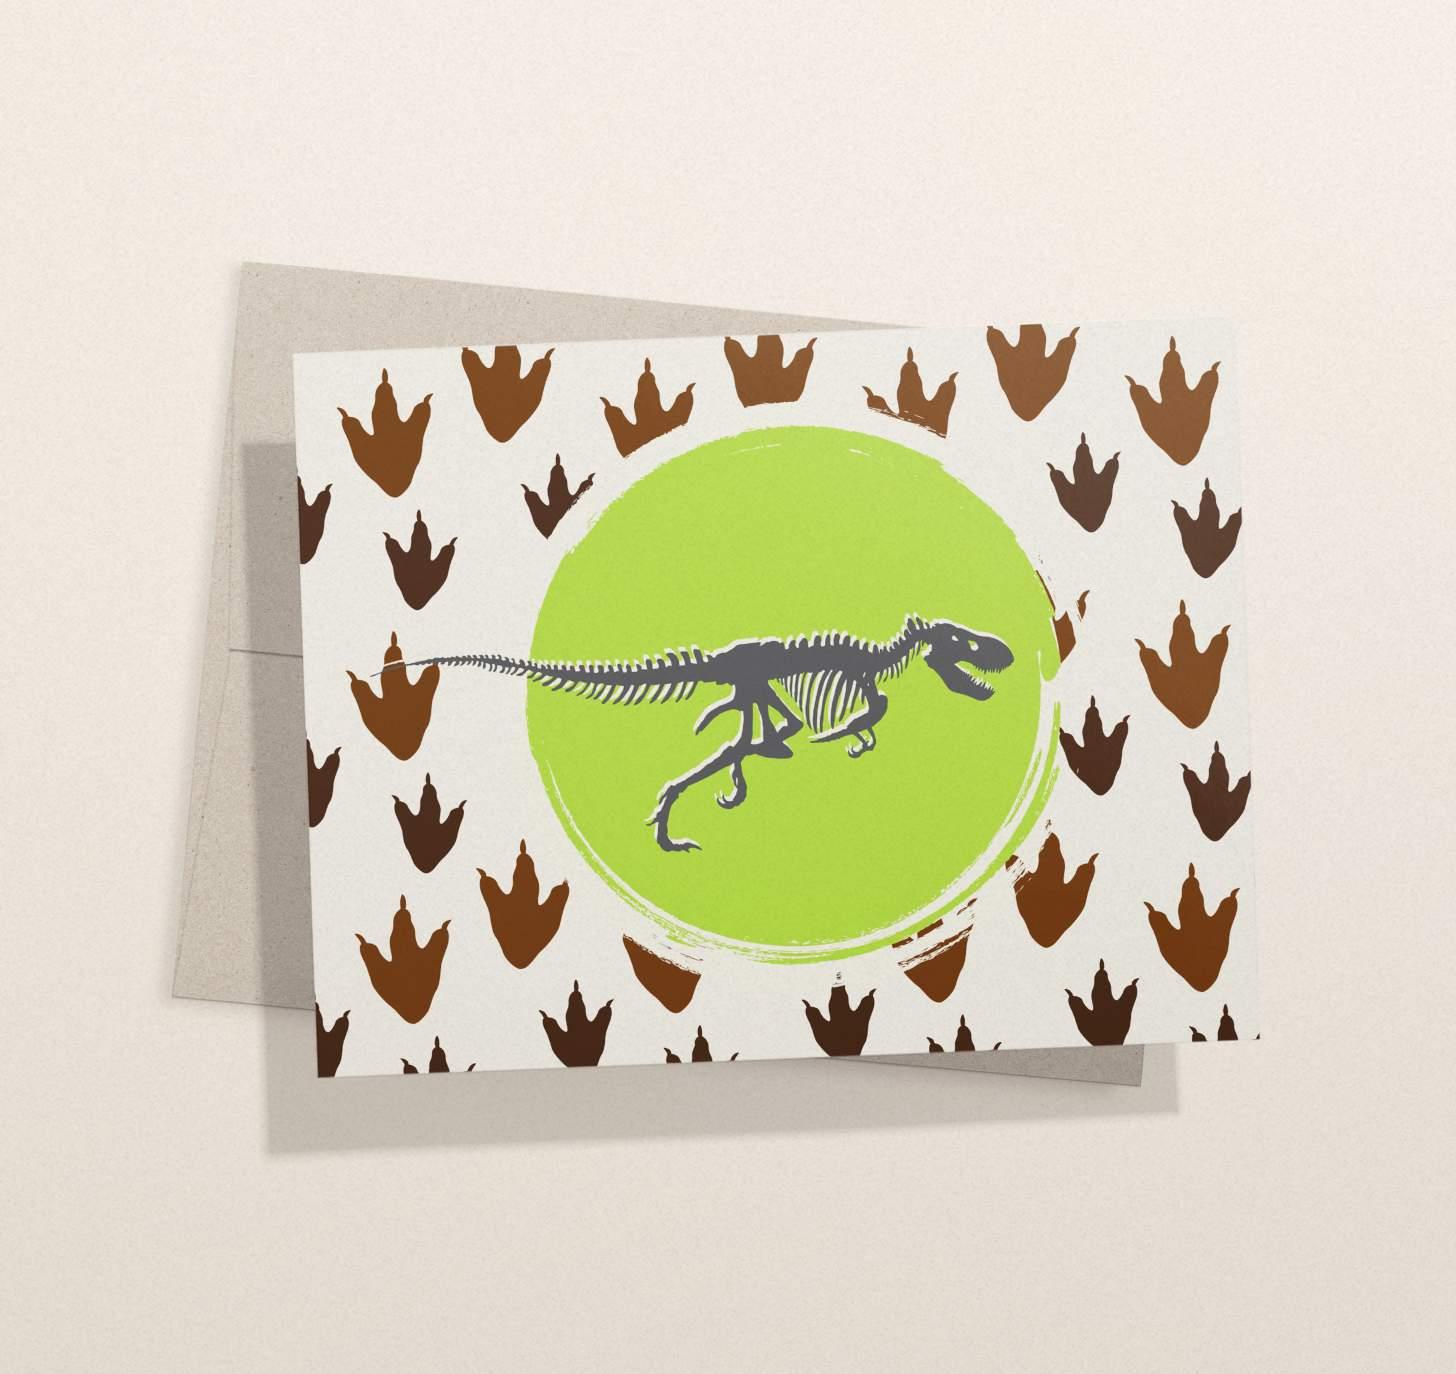 T-Rex bones with footprints design card with envelope